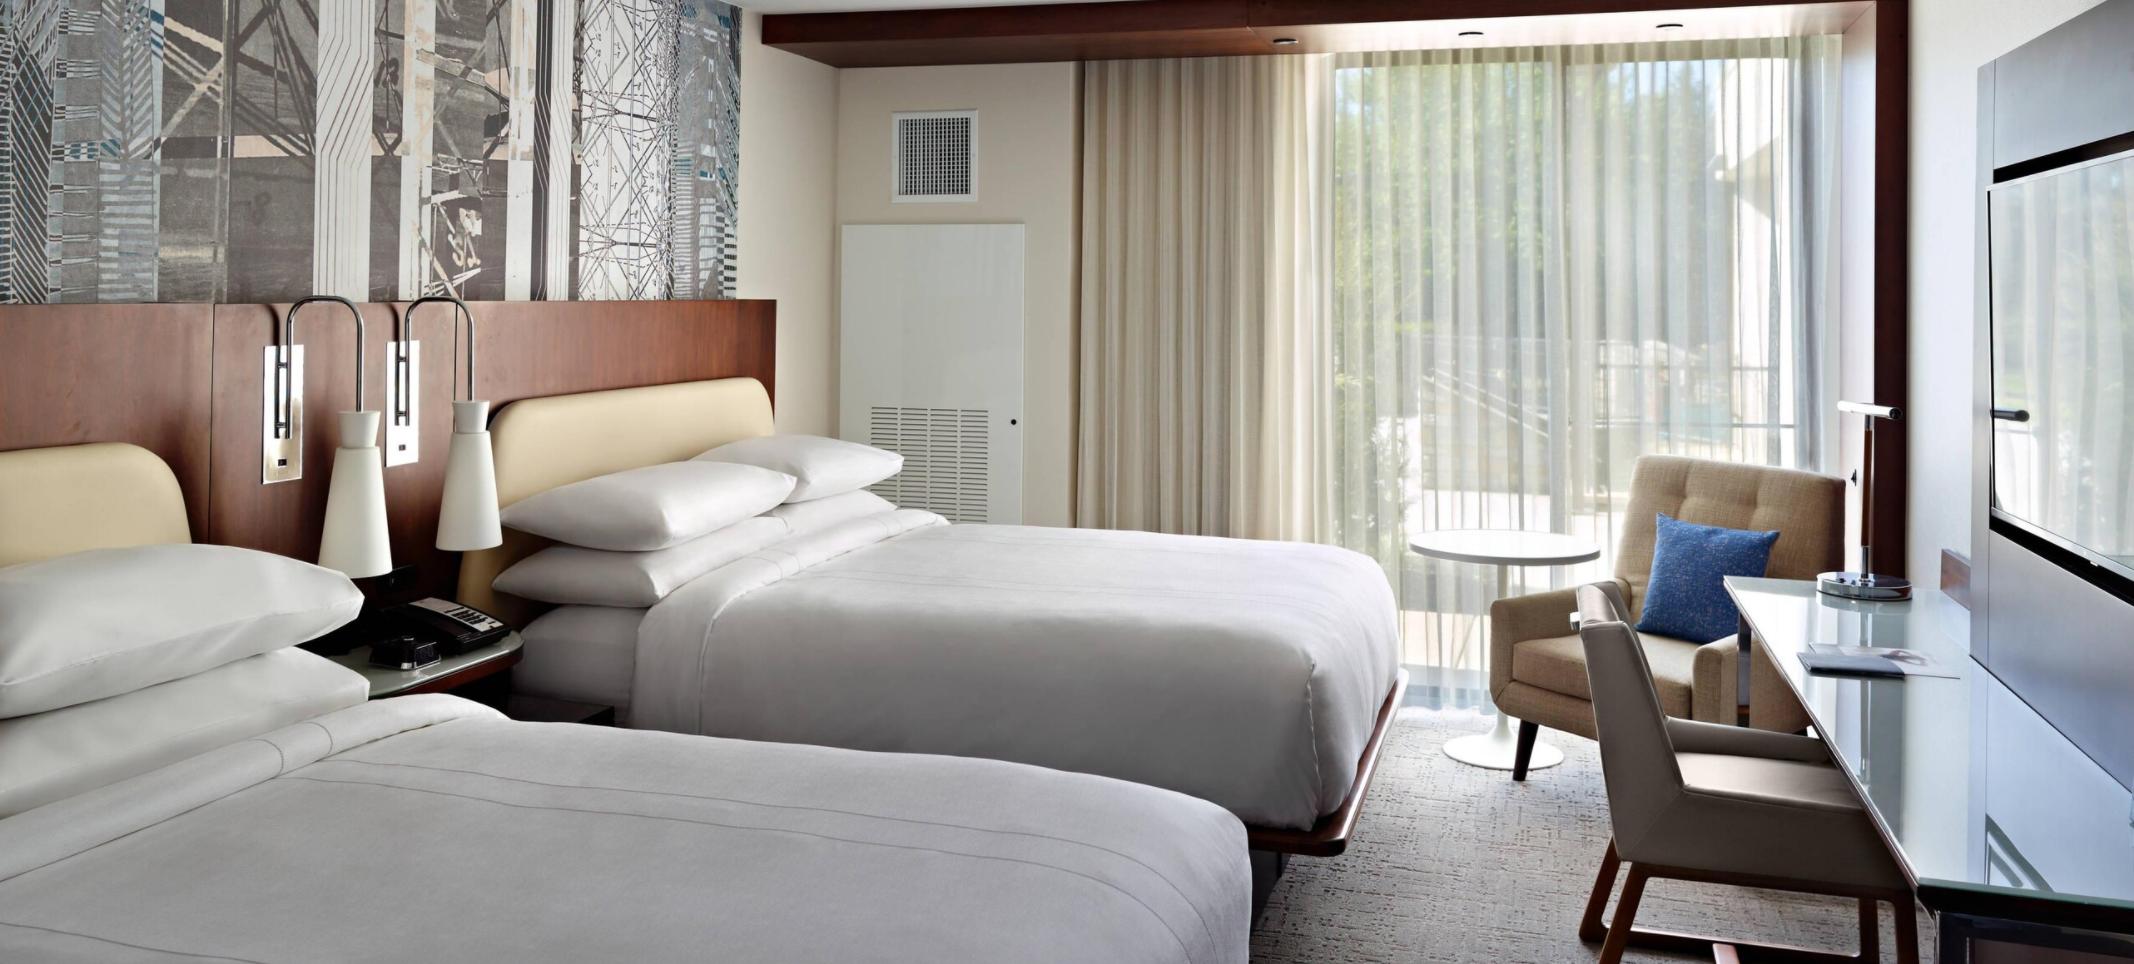 https://www.hotelsbyday.com/_data/default-hotel_image/3/18523/screenshot-2020-06-12-at-5-19-45-pm.png